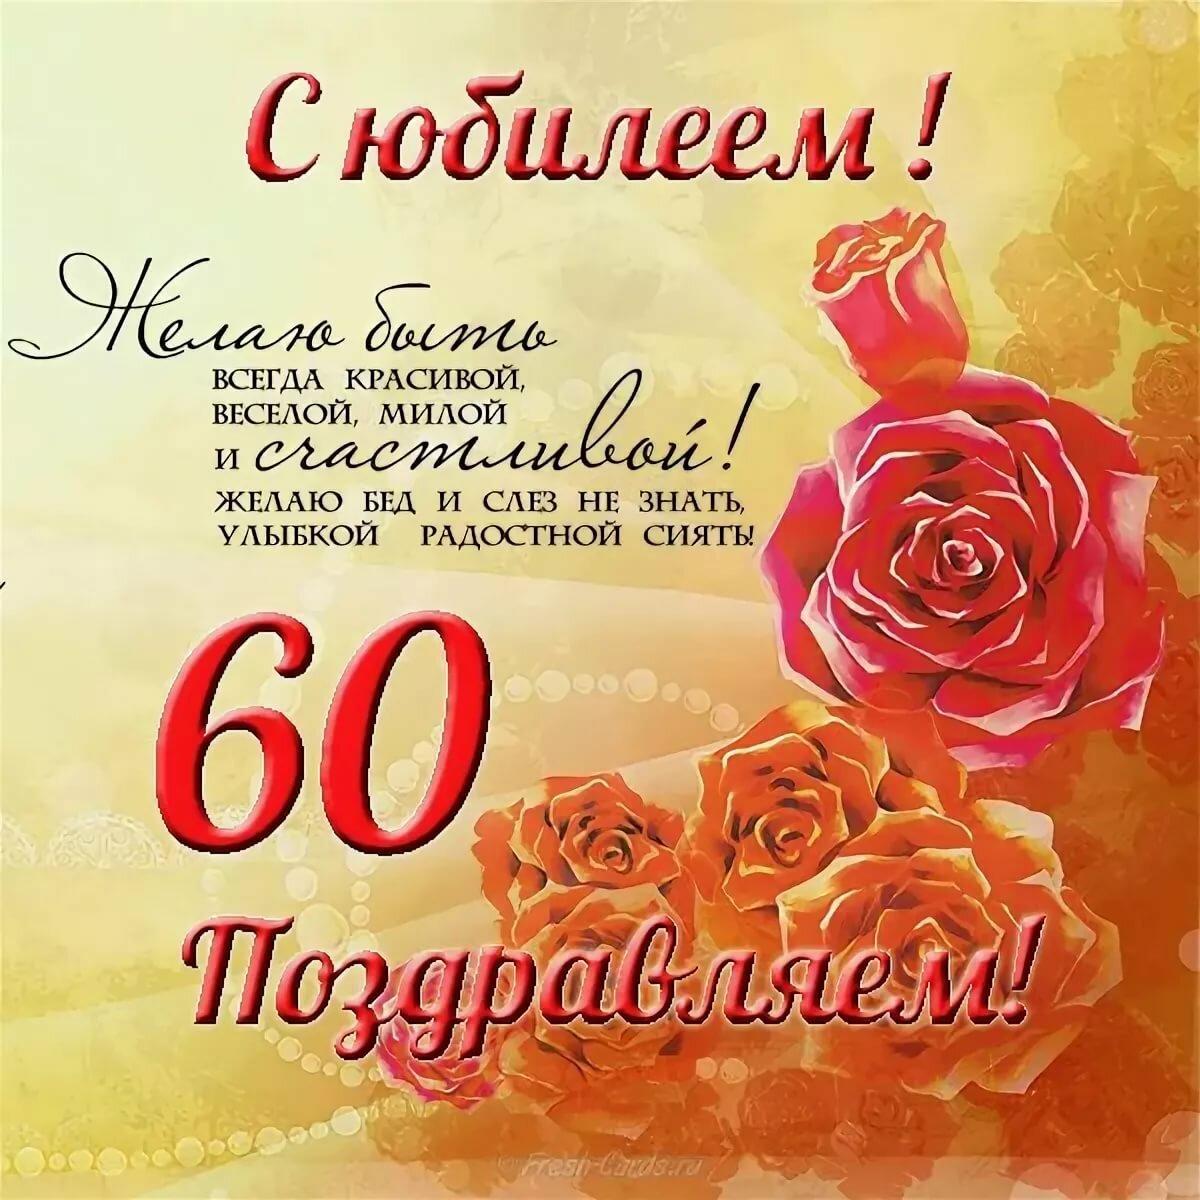 Картинки к 60 летию женщины